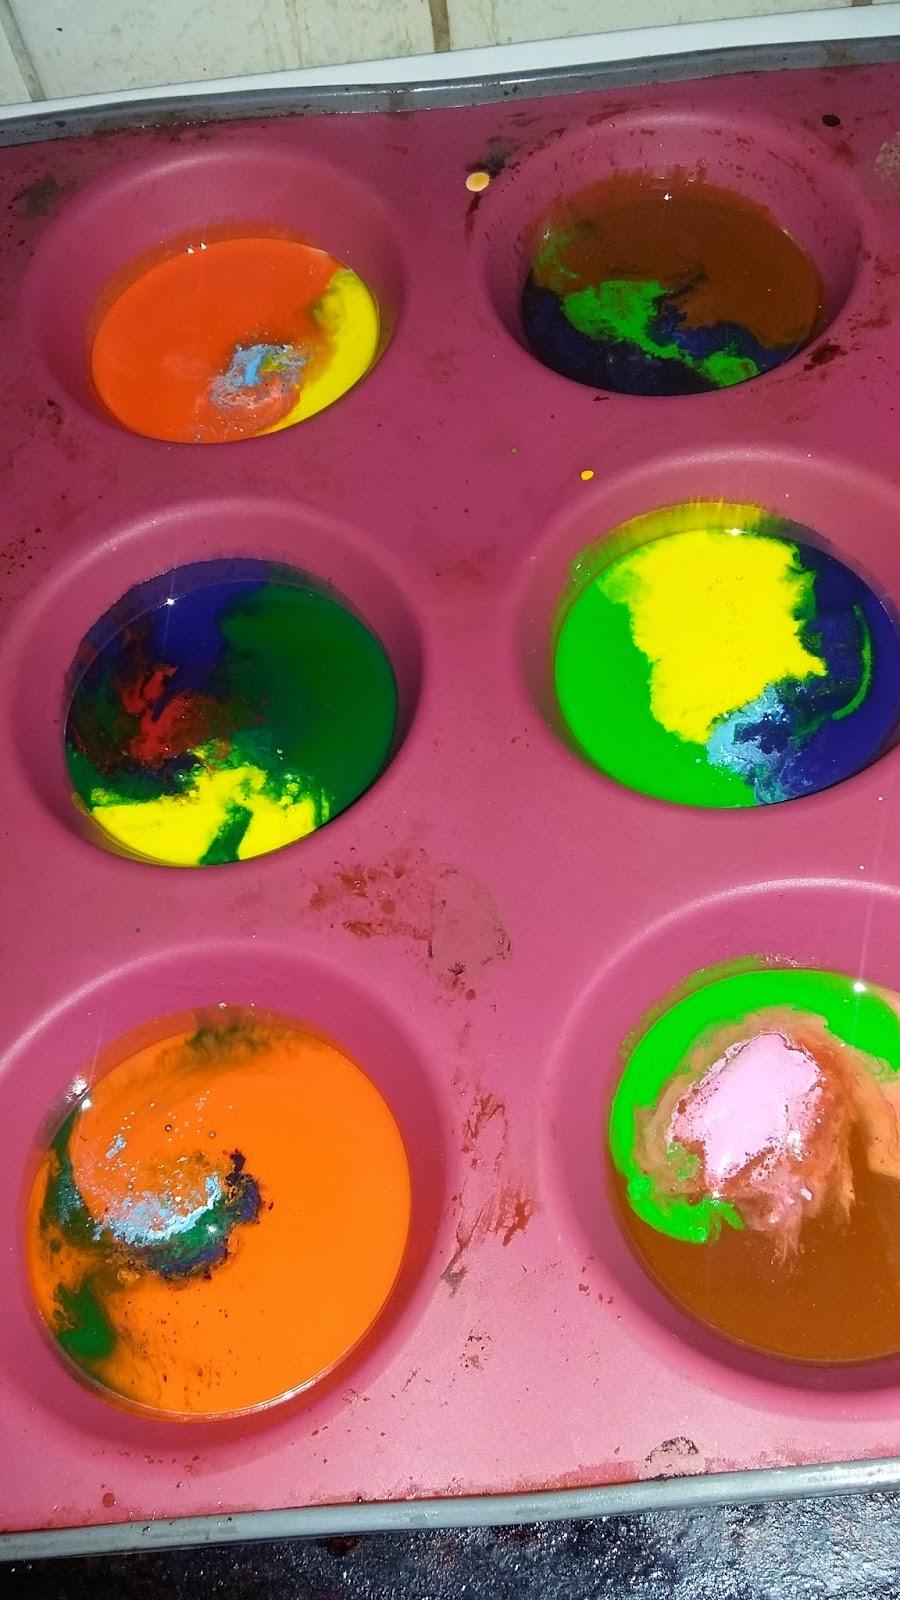 http://lifewithbabykicks.blogspot.ae/2015/03/rainbow-crayonning.html